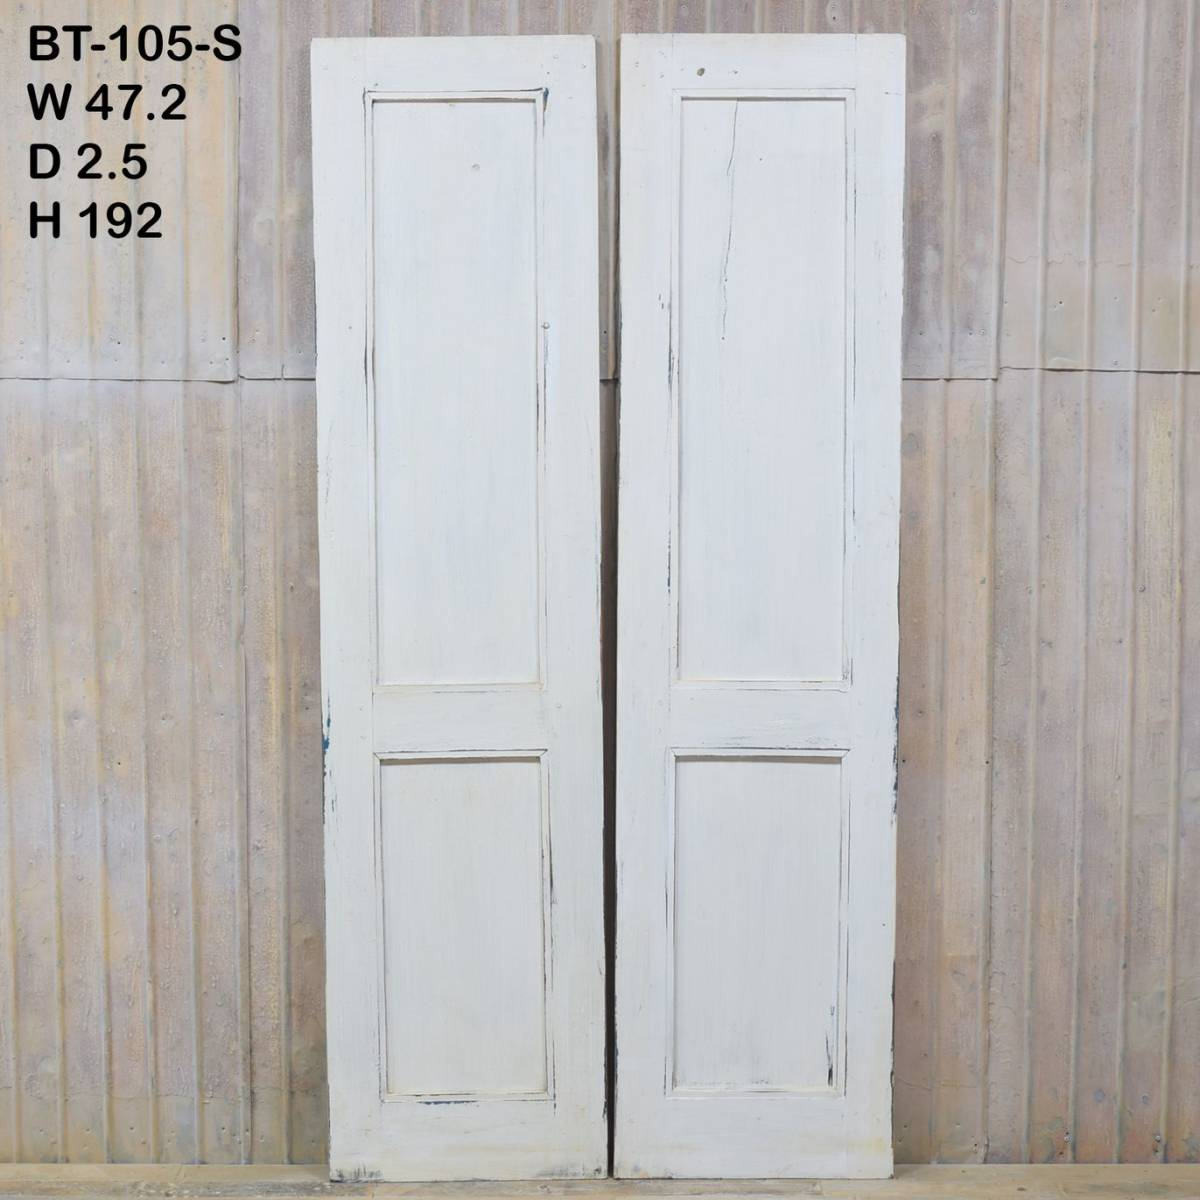 S-105〈即決〉W94×H192 ドアノブ外し穴修復済み 観音開きアンティークドア 2枚組 店舗リノベーション 扉 古い洋館の木製建具 ftg